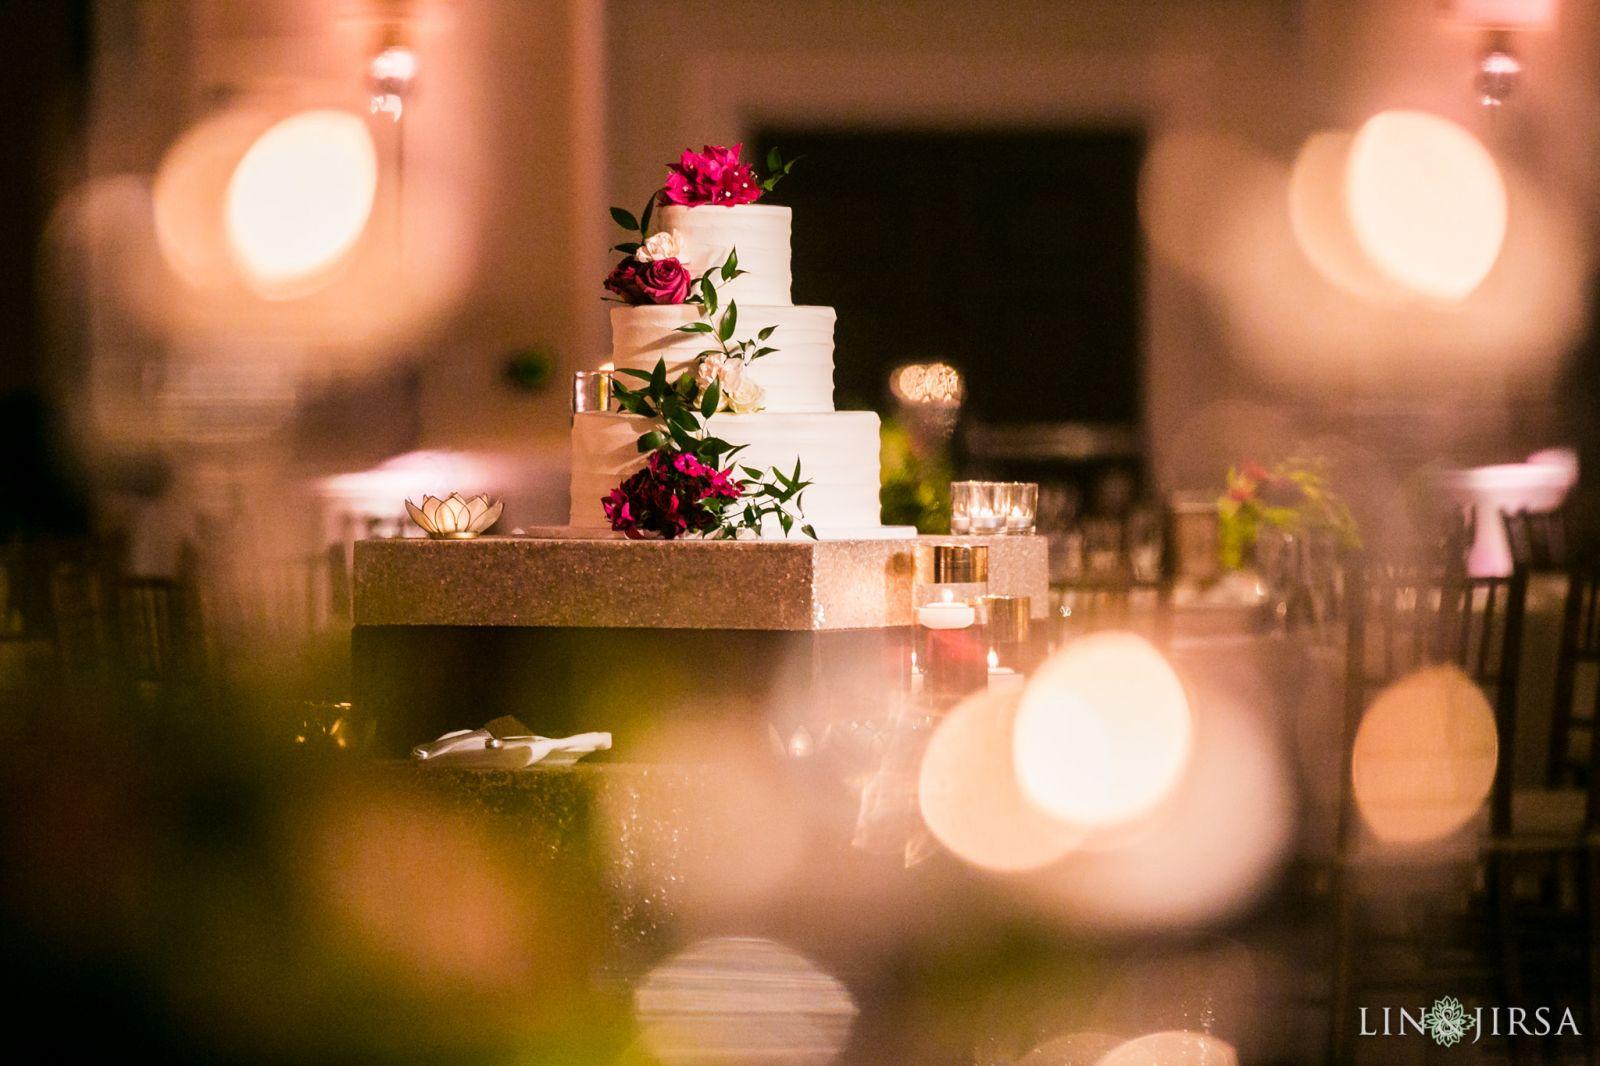 kismet-wedding-inspiration-pics-68.jpg